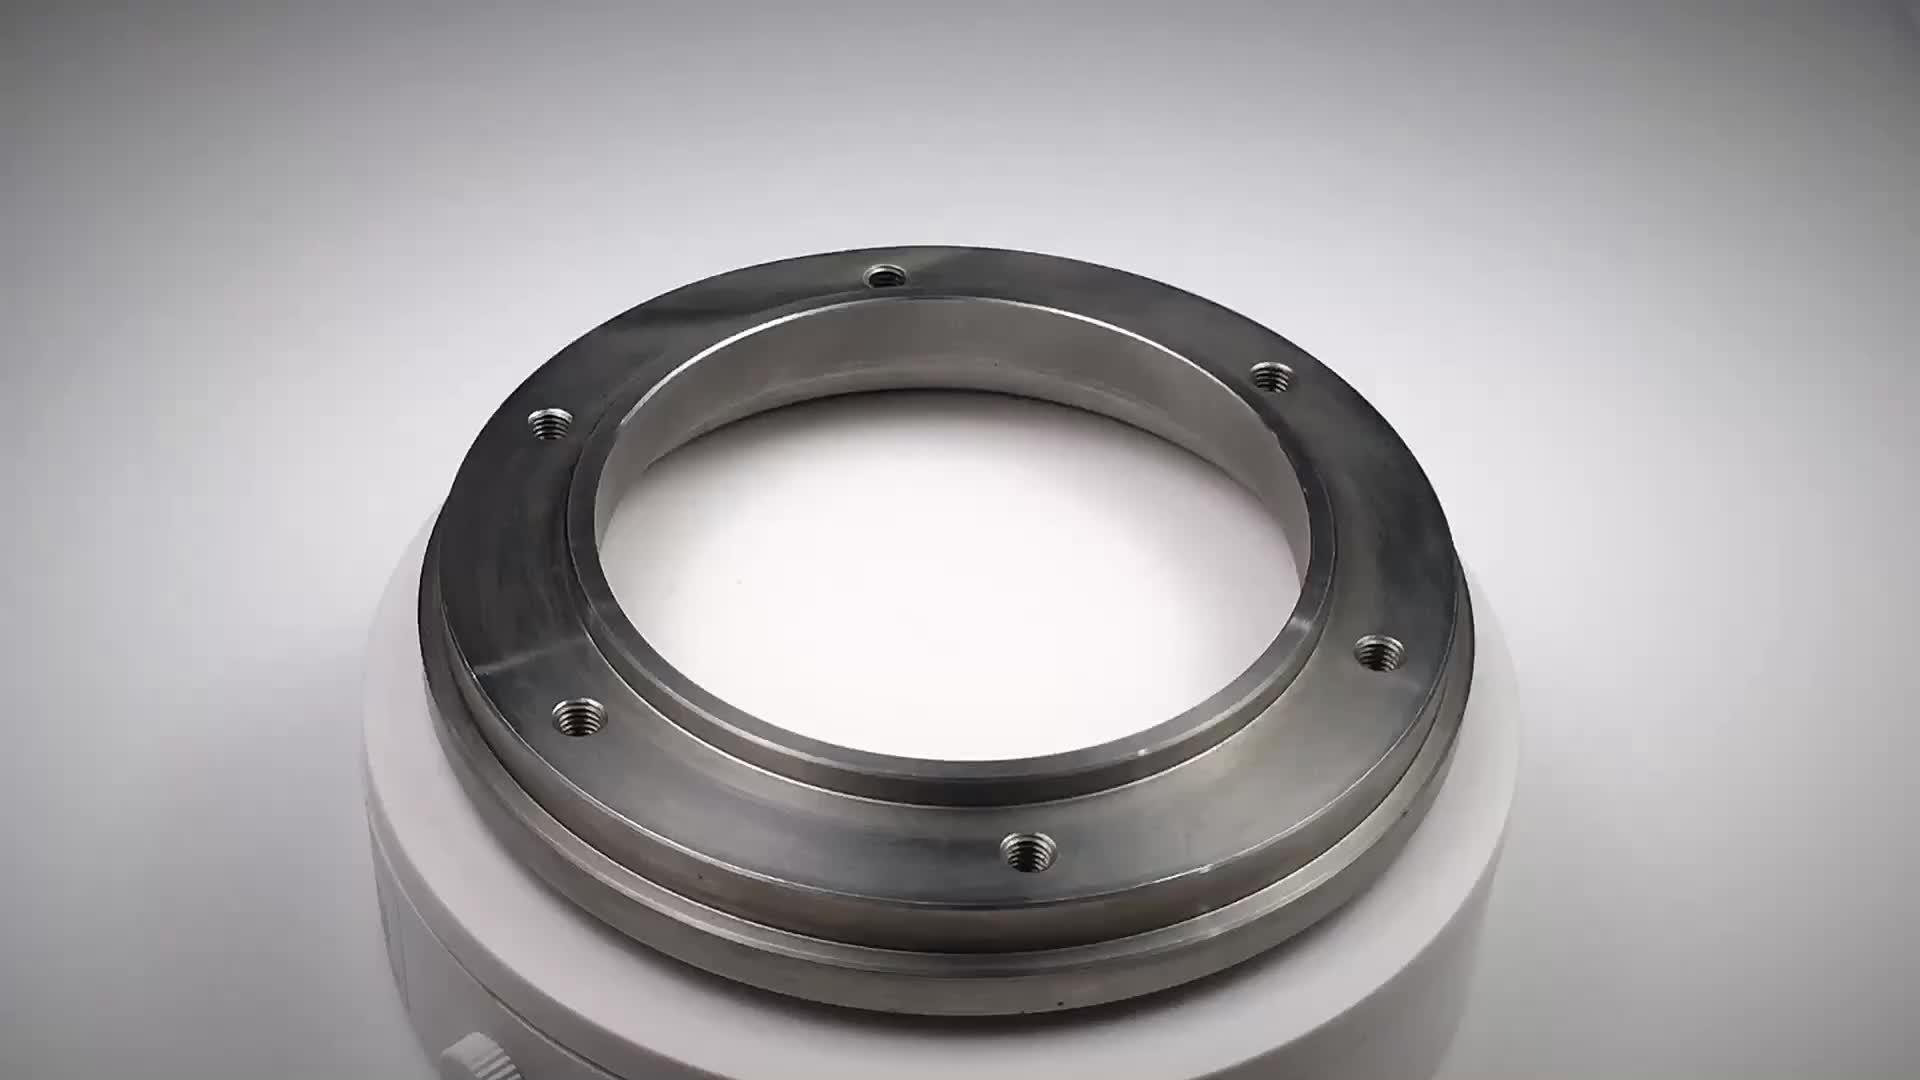 CNC 機械加工フランジインベストメント鋳造